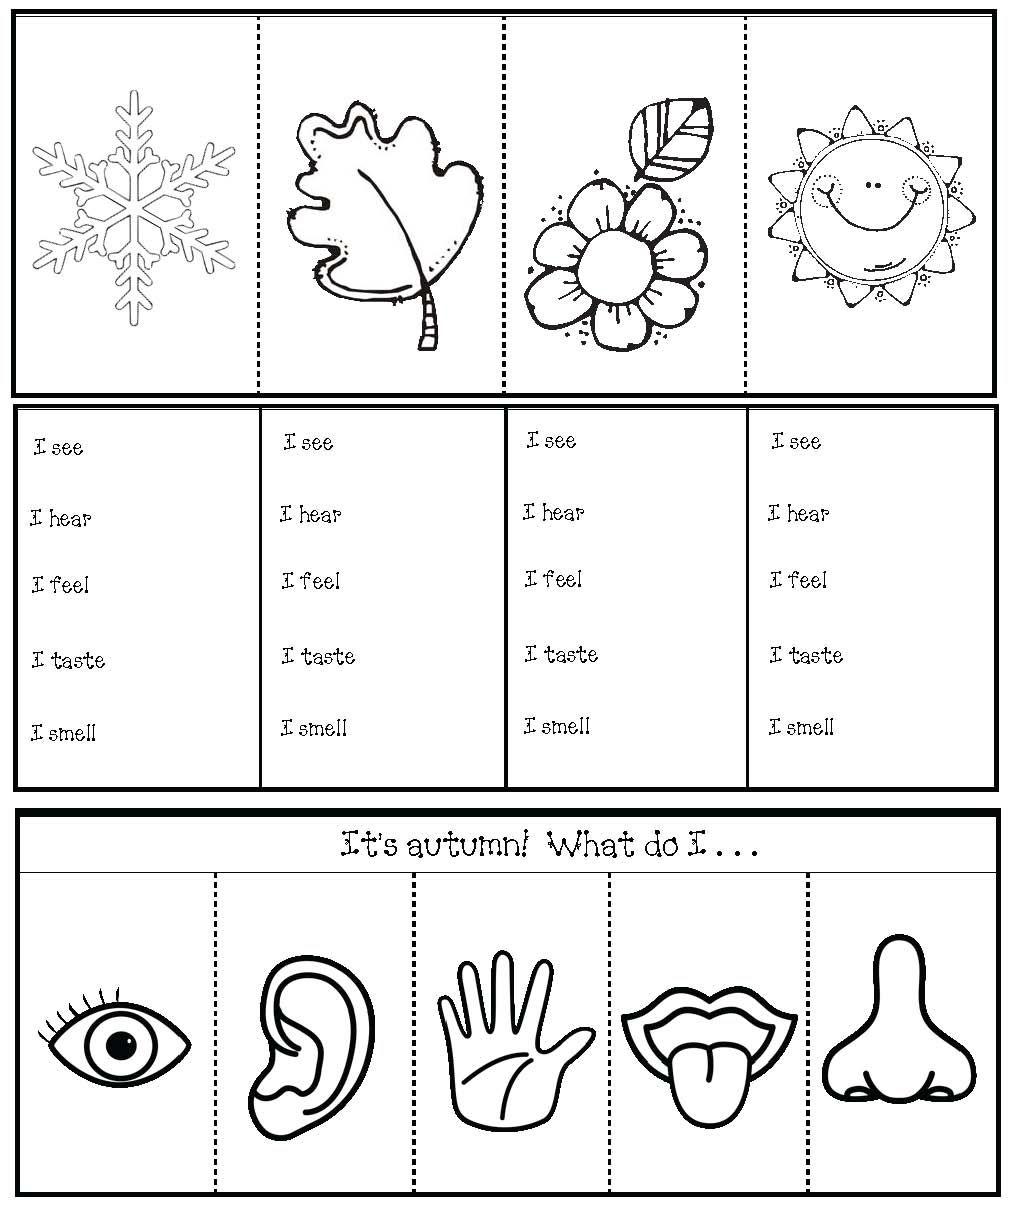 seasons senses activities pr rodoveda senses activities senses preschool a 5 senses. Black Bedroom Furniture Sets. Home Design Ideas